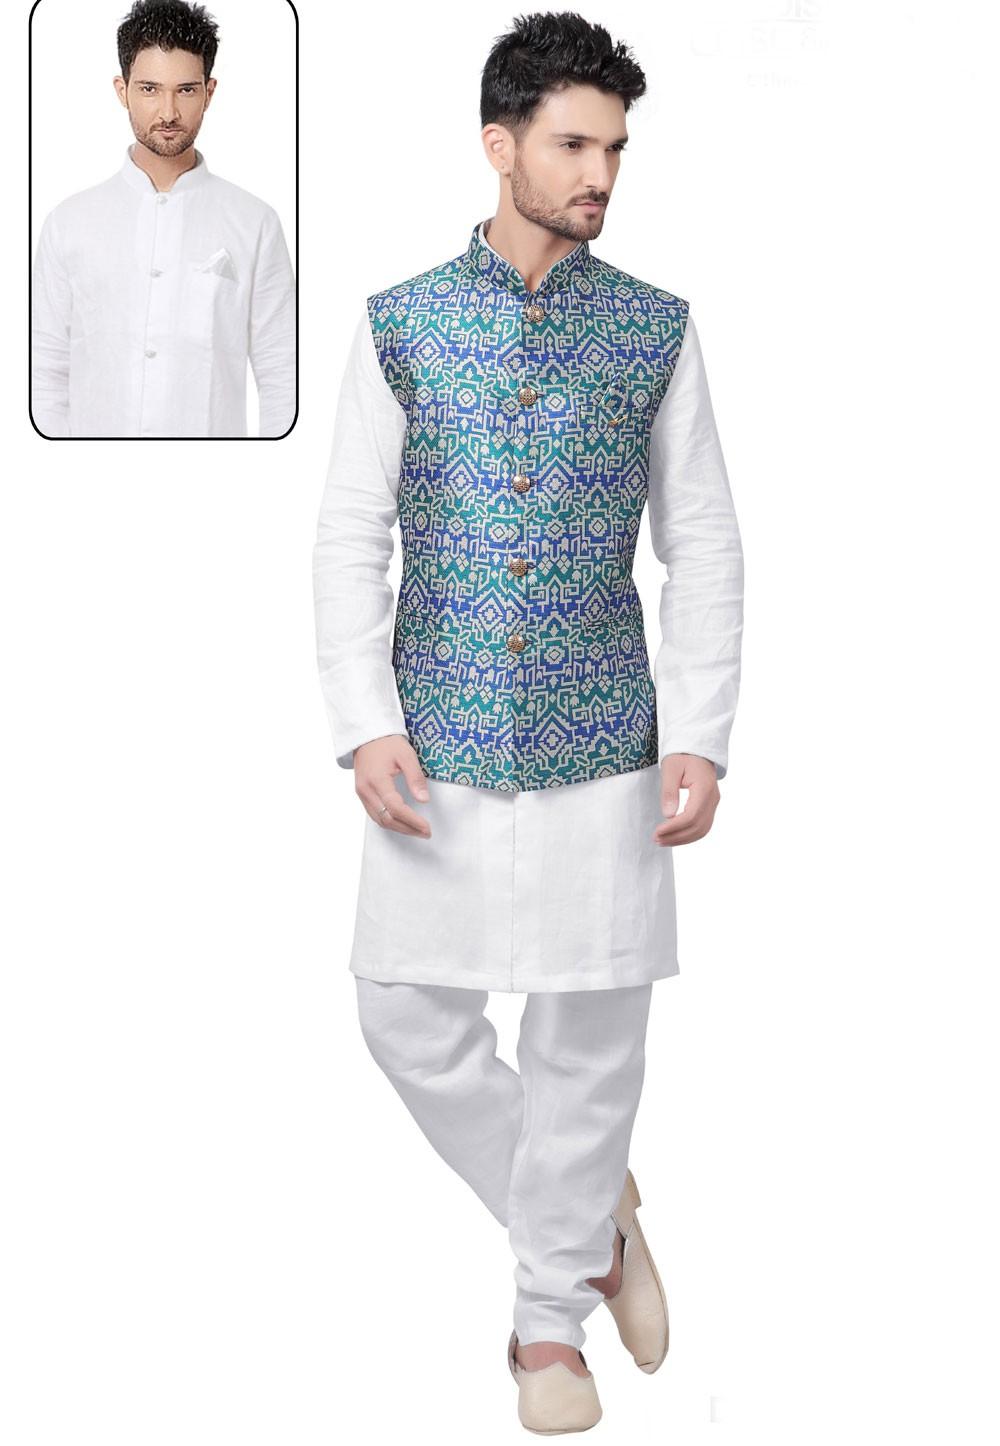 Raglan Sleeves White,Green Color Latest Kurta Pajama with Nehru Jacket